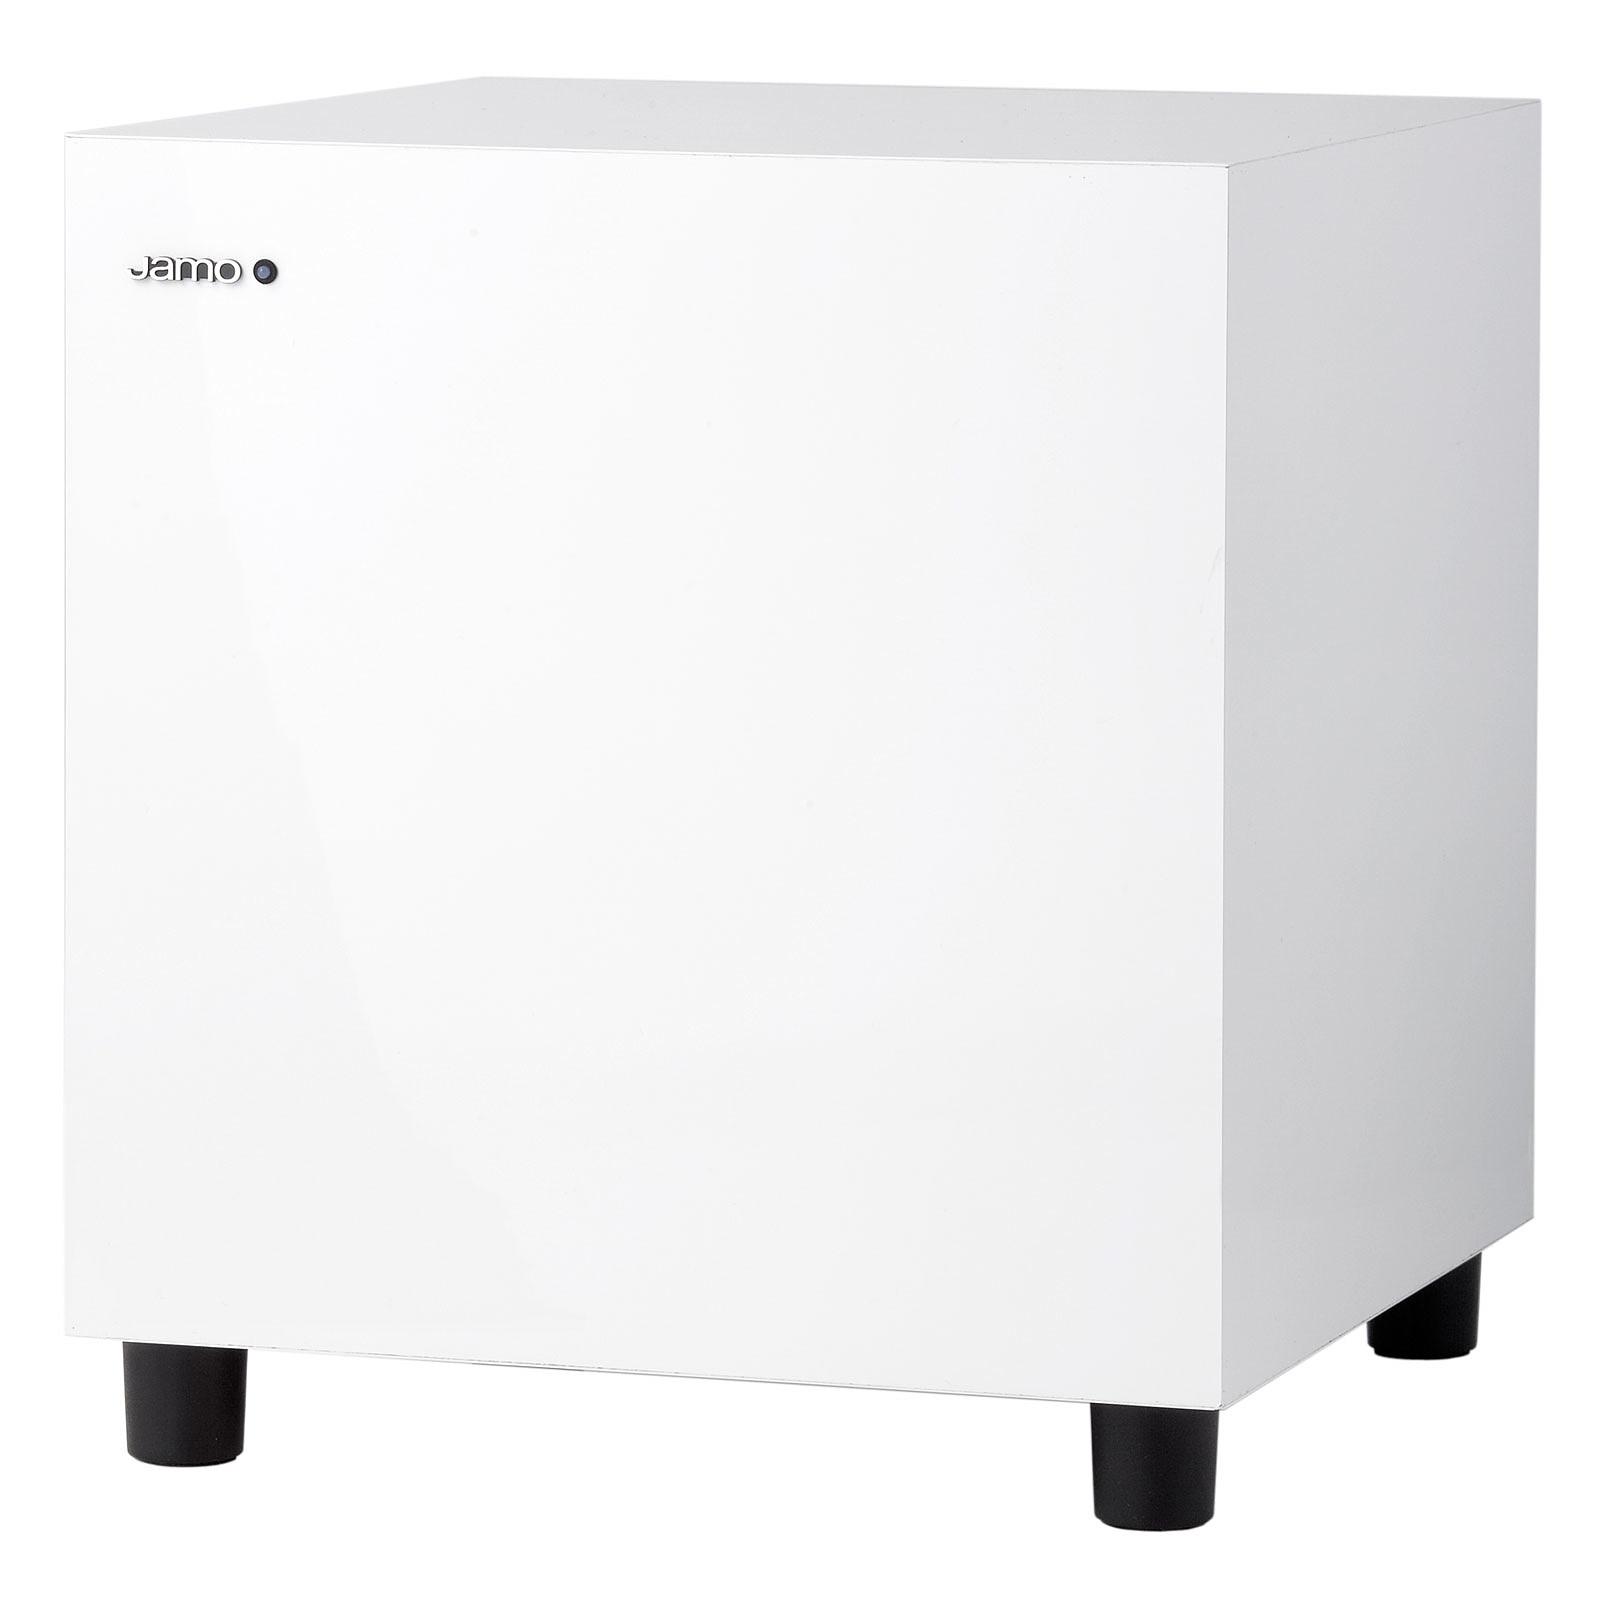 Jamo SUB 210 High Gloss White